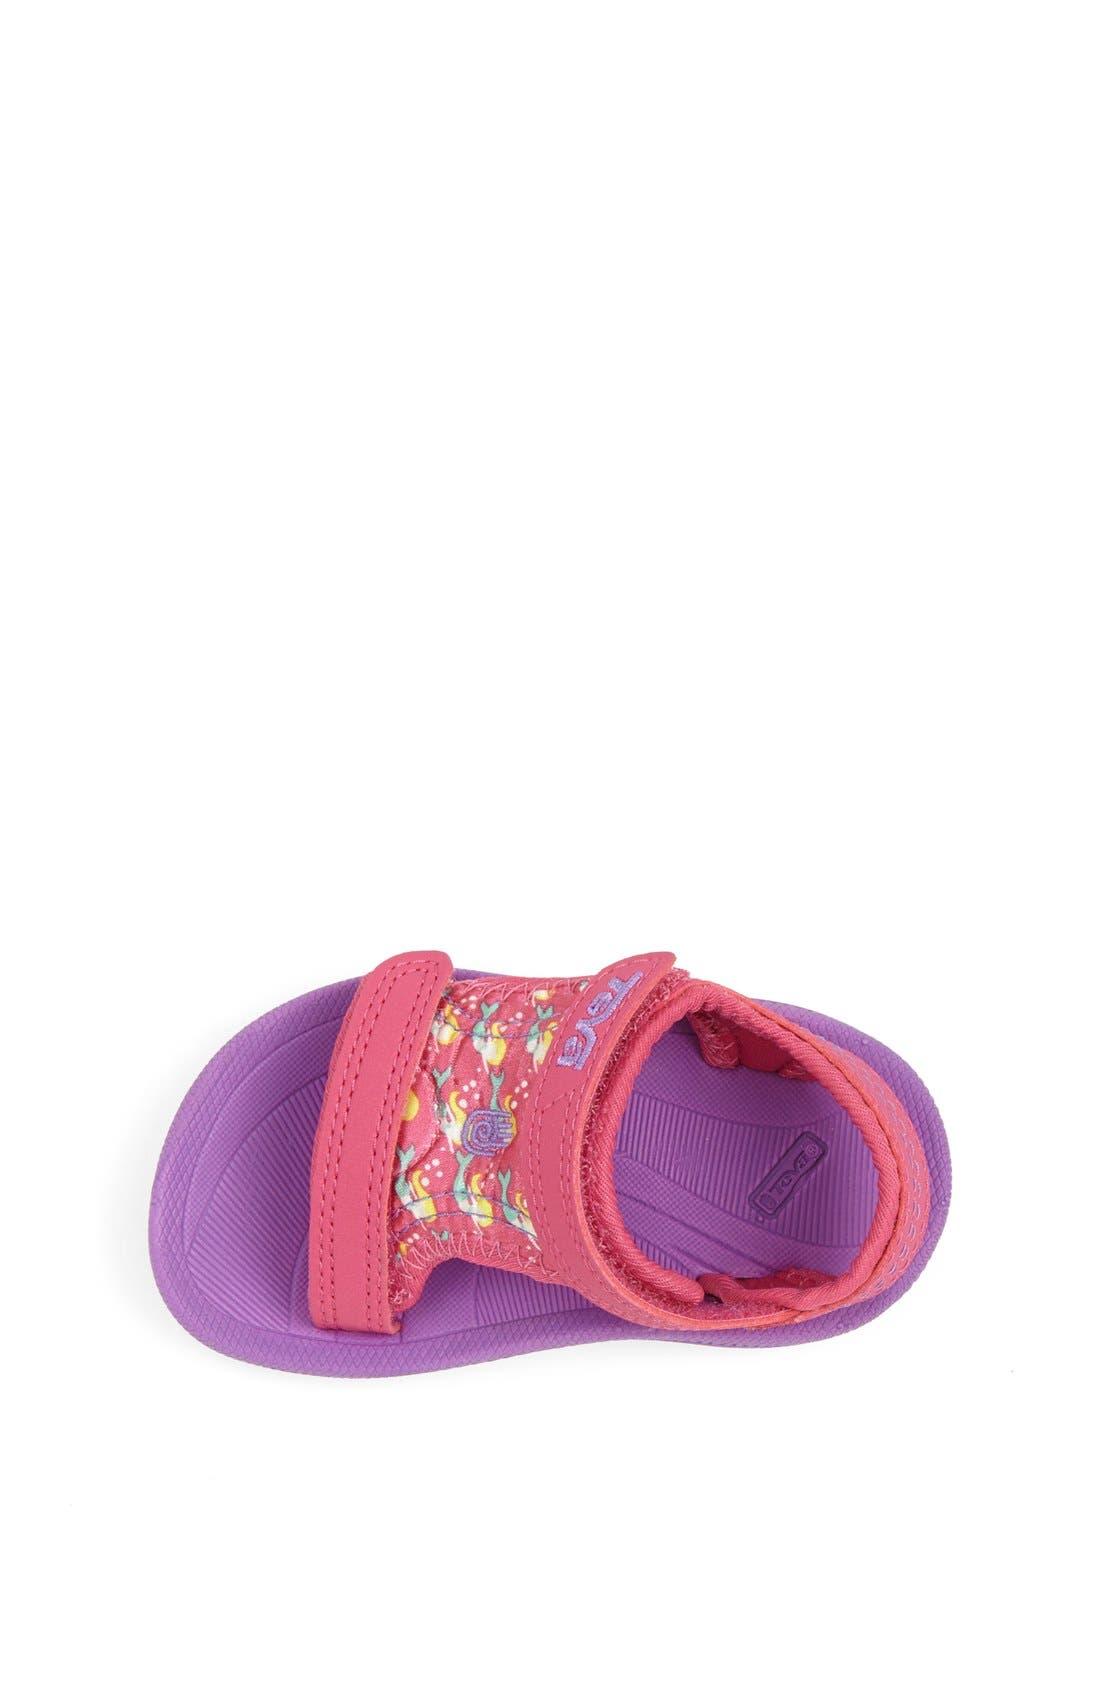 Alternate Image 3  - Teva 'Psyclone' Print Sandal (Baby, Walker & Toddler)